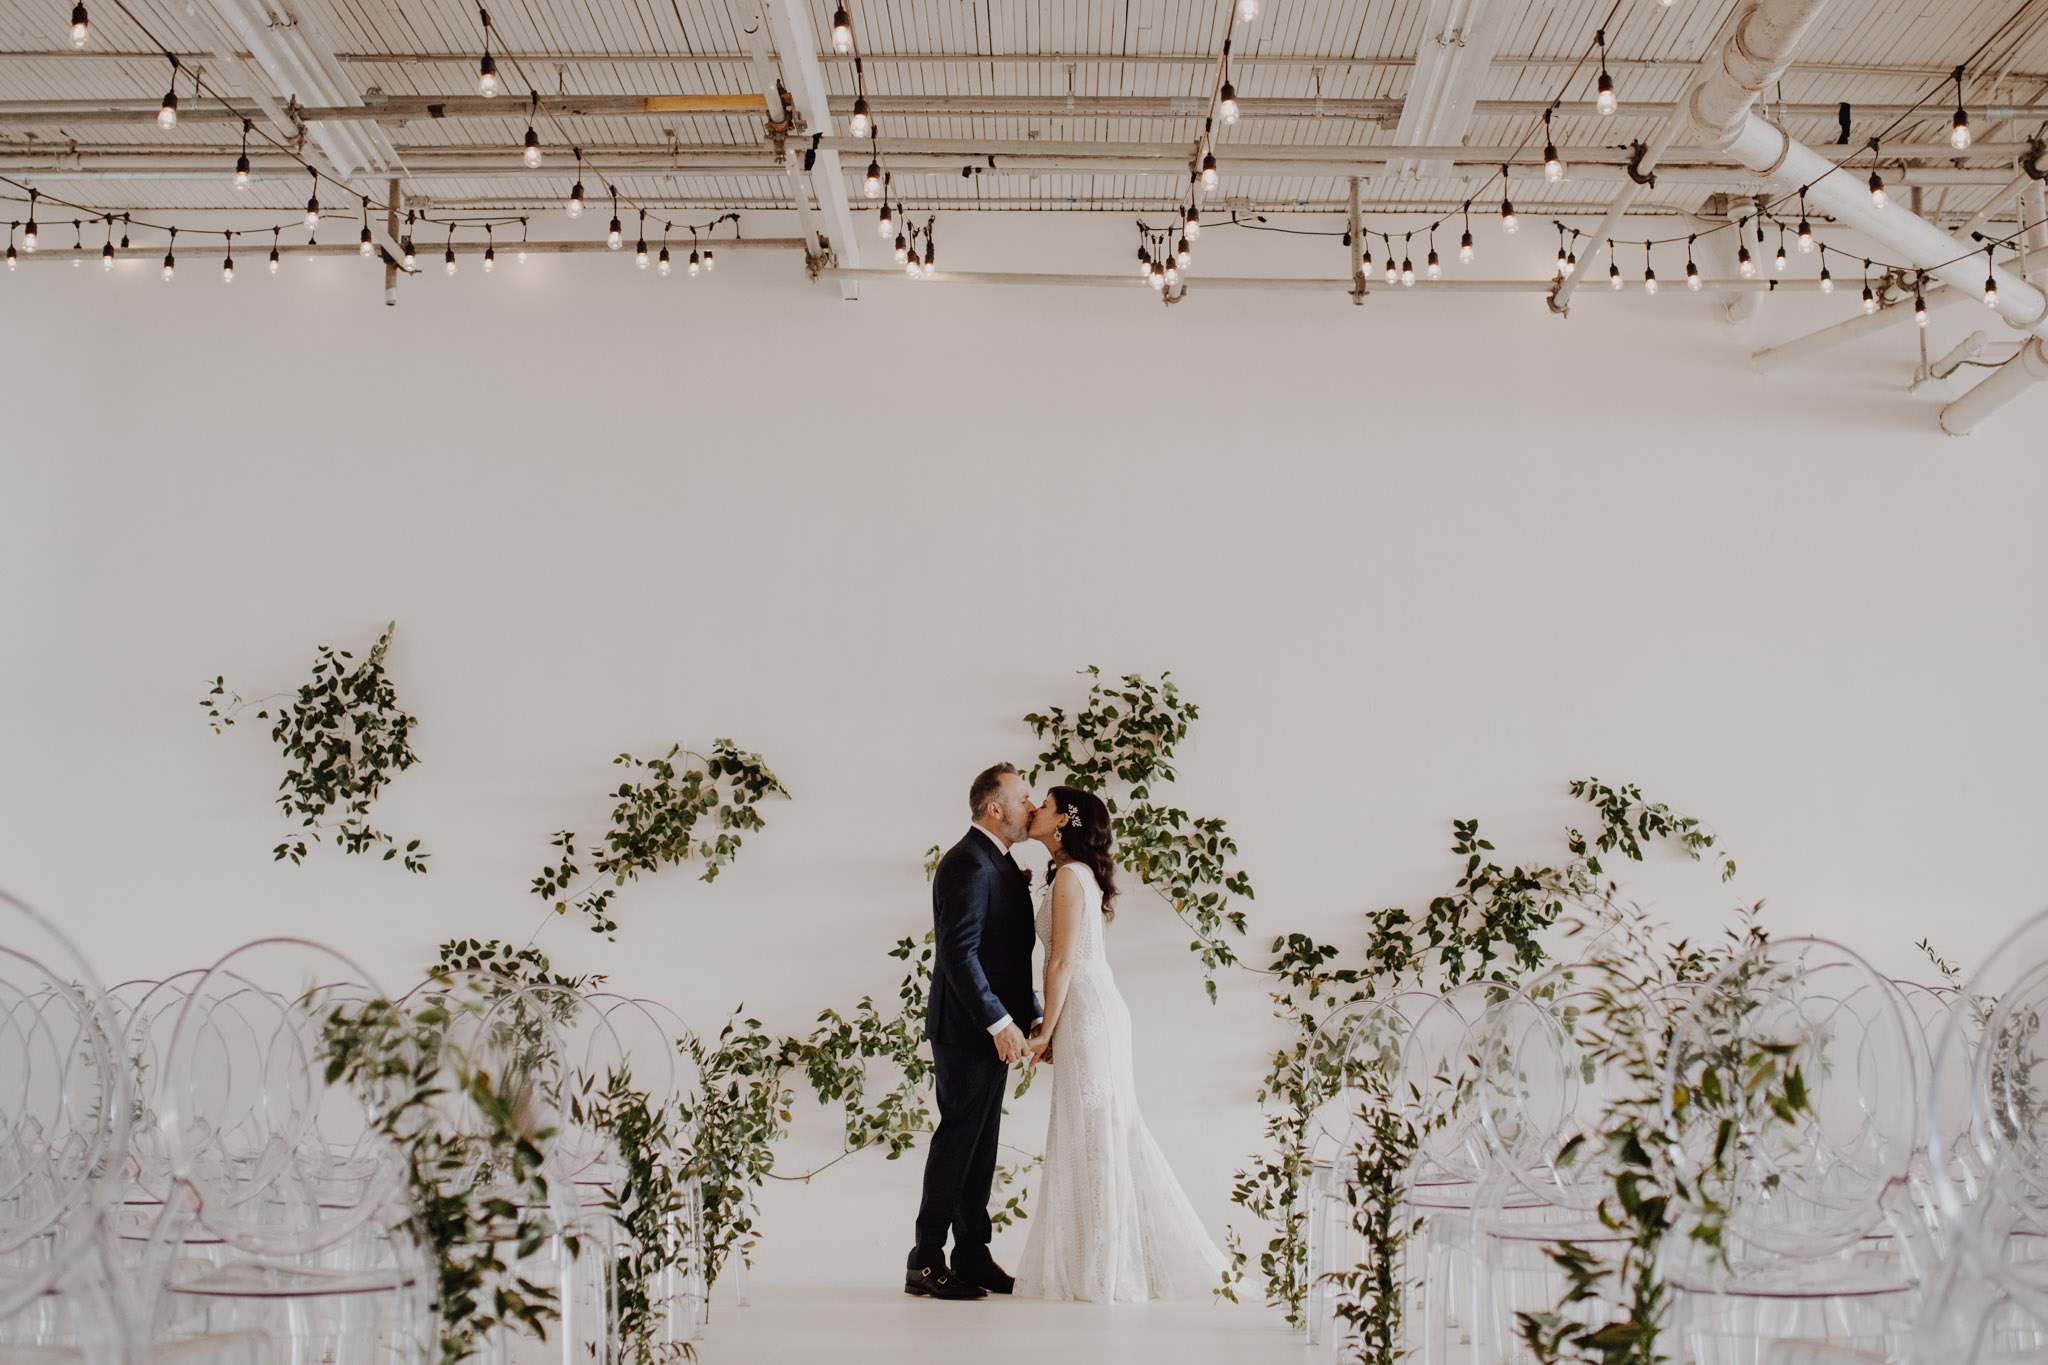 District 28 Wedding Toronto - Bride & groom kiss white backdrop